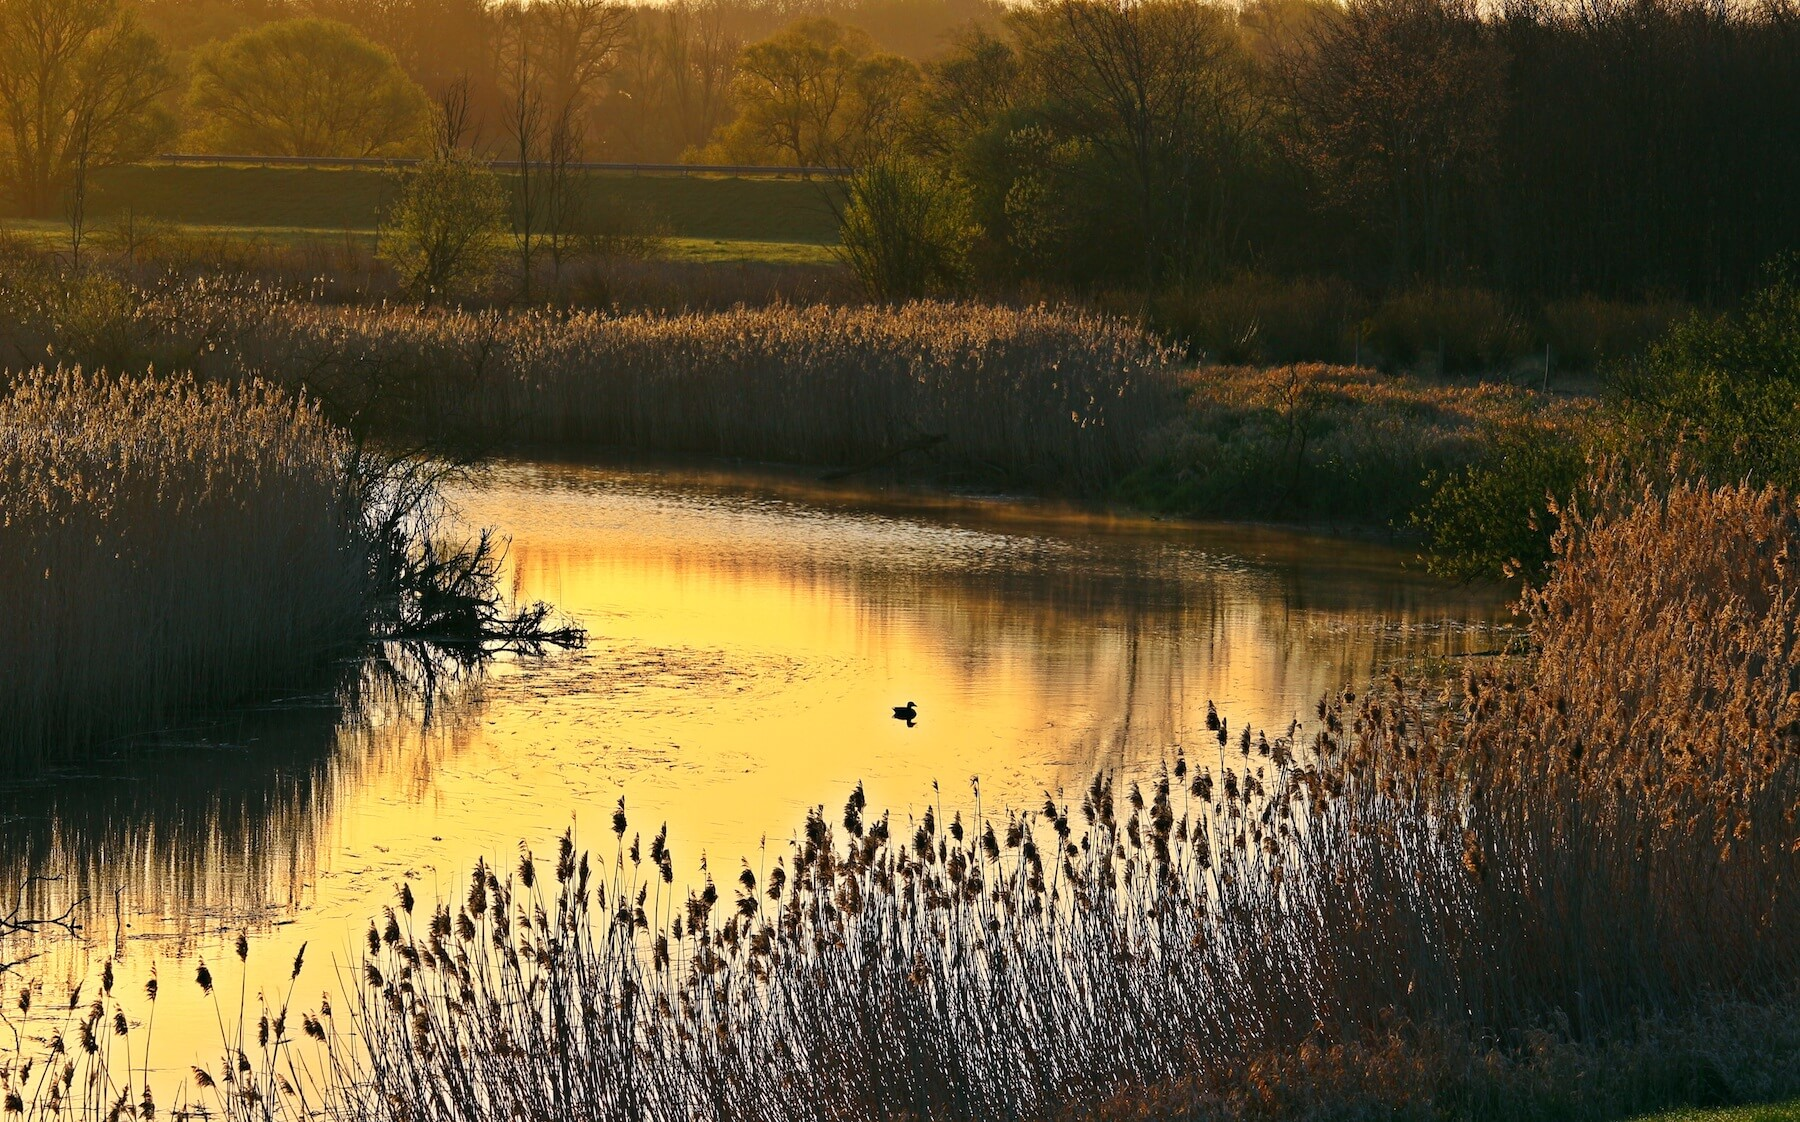 river-reed-elbe-river-bend-163061.jpeg